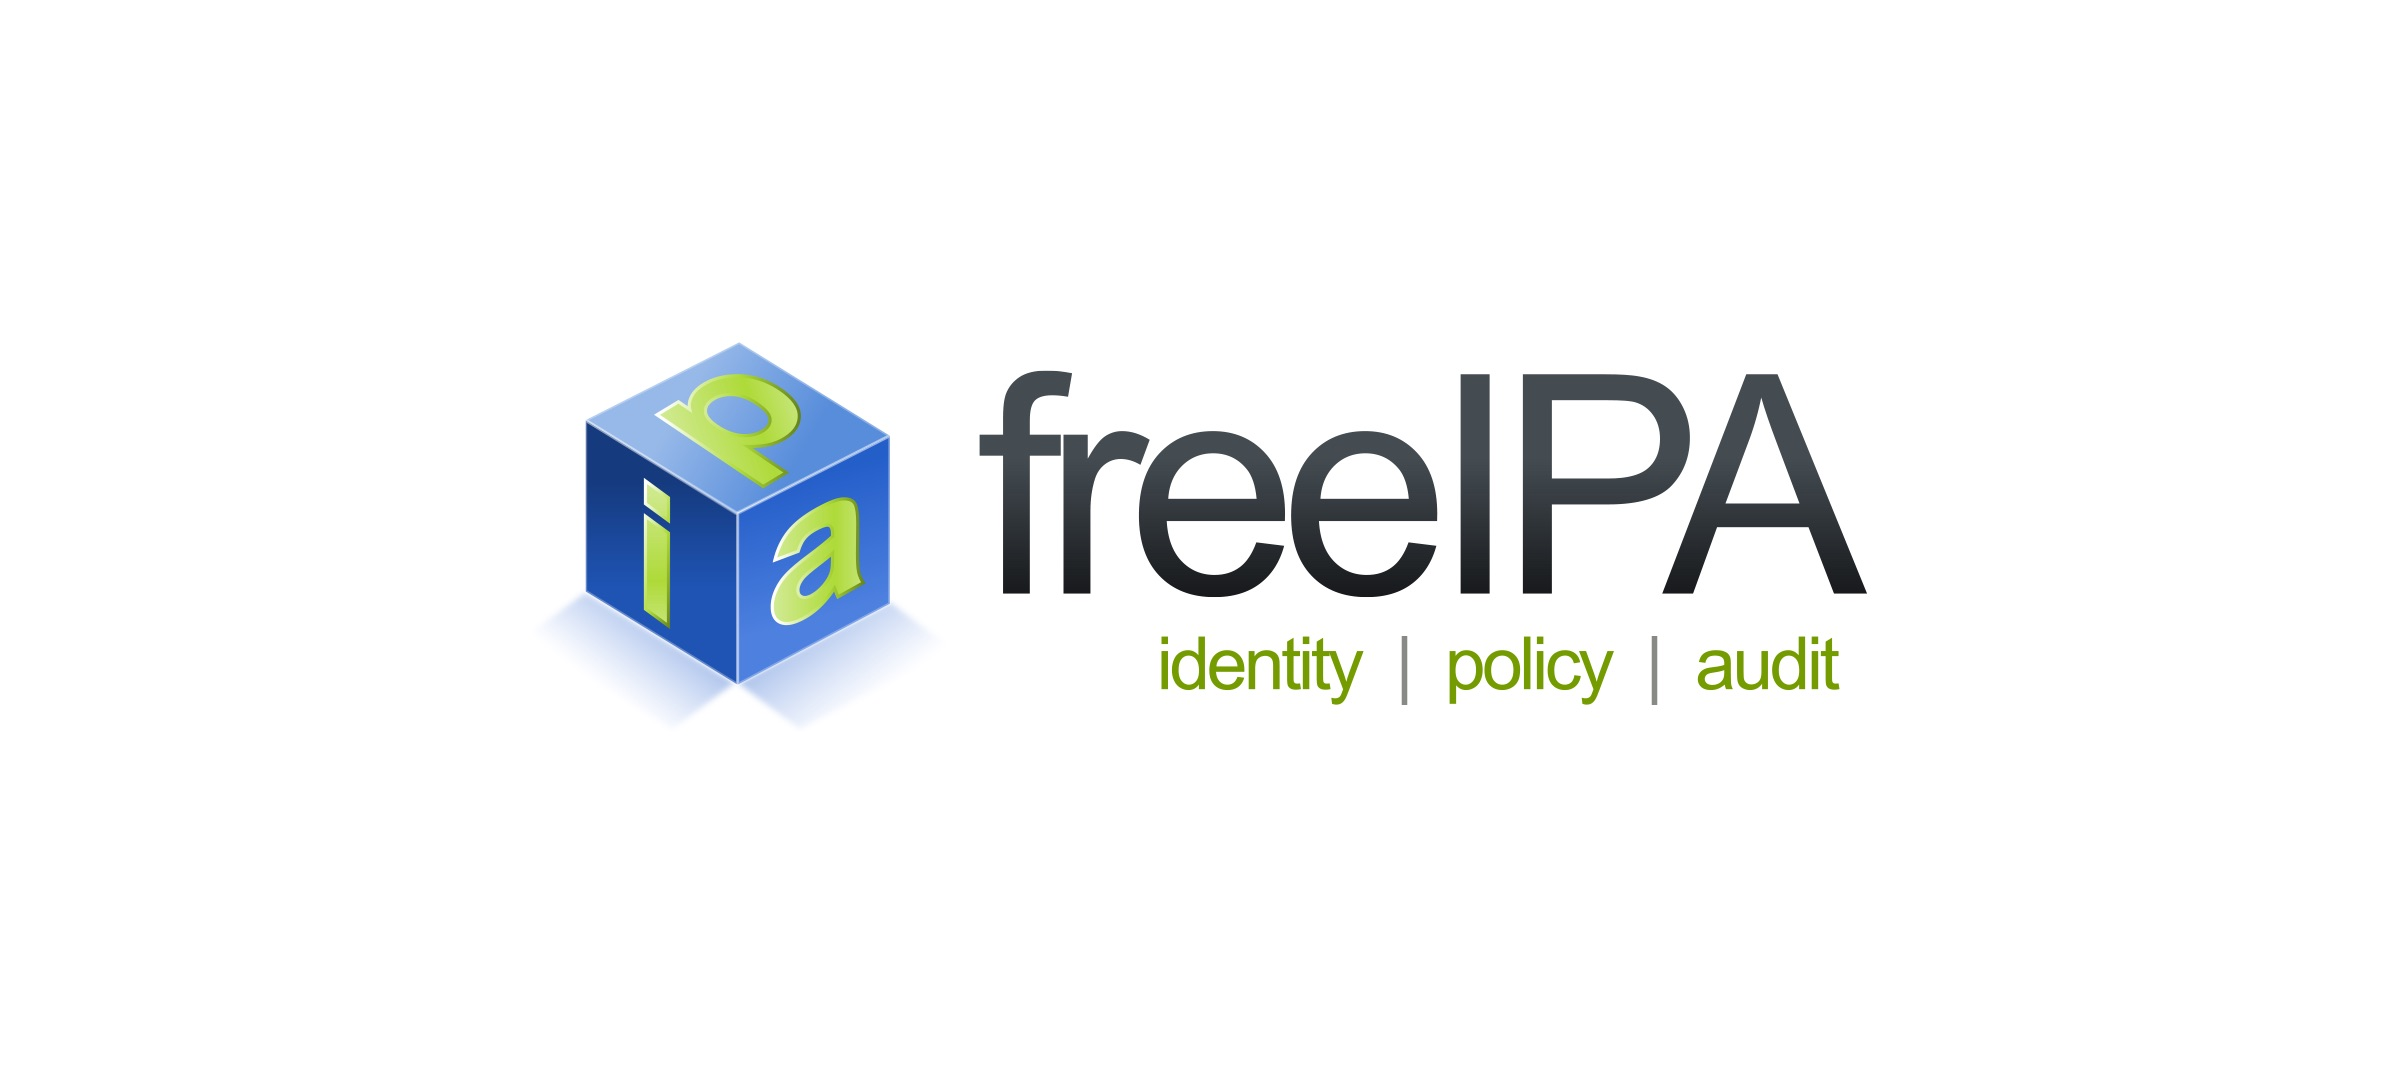 Как настроить аутентификацию GitLab FreeIPA